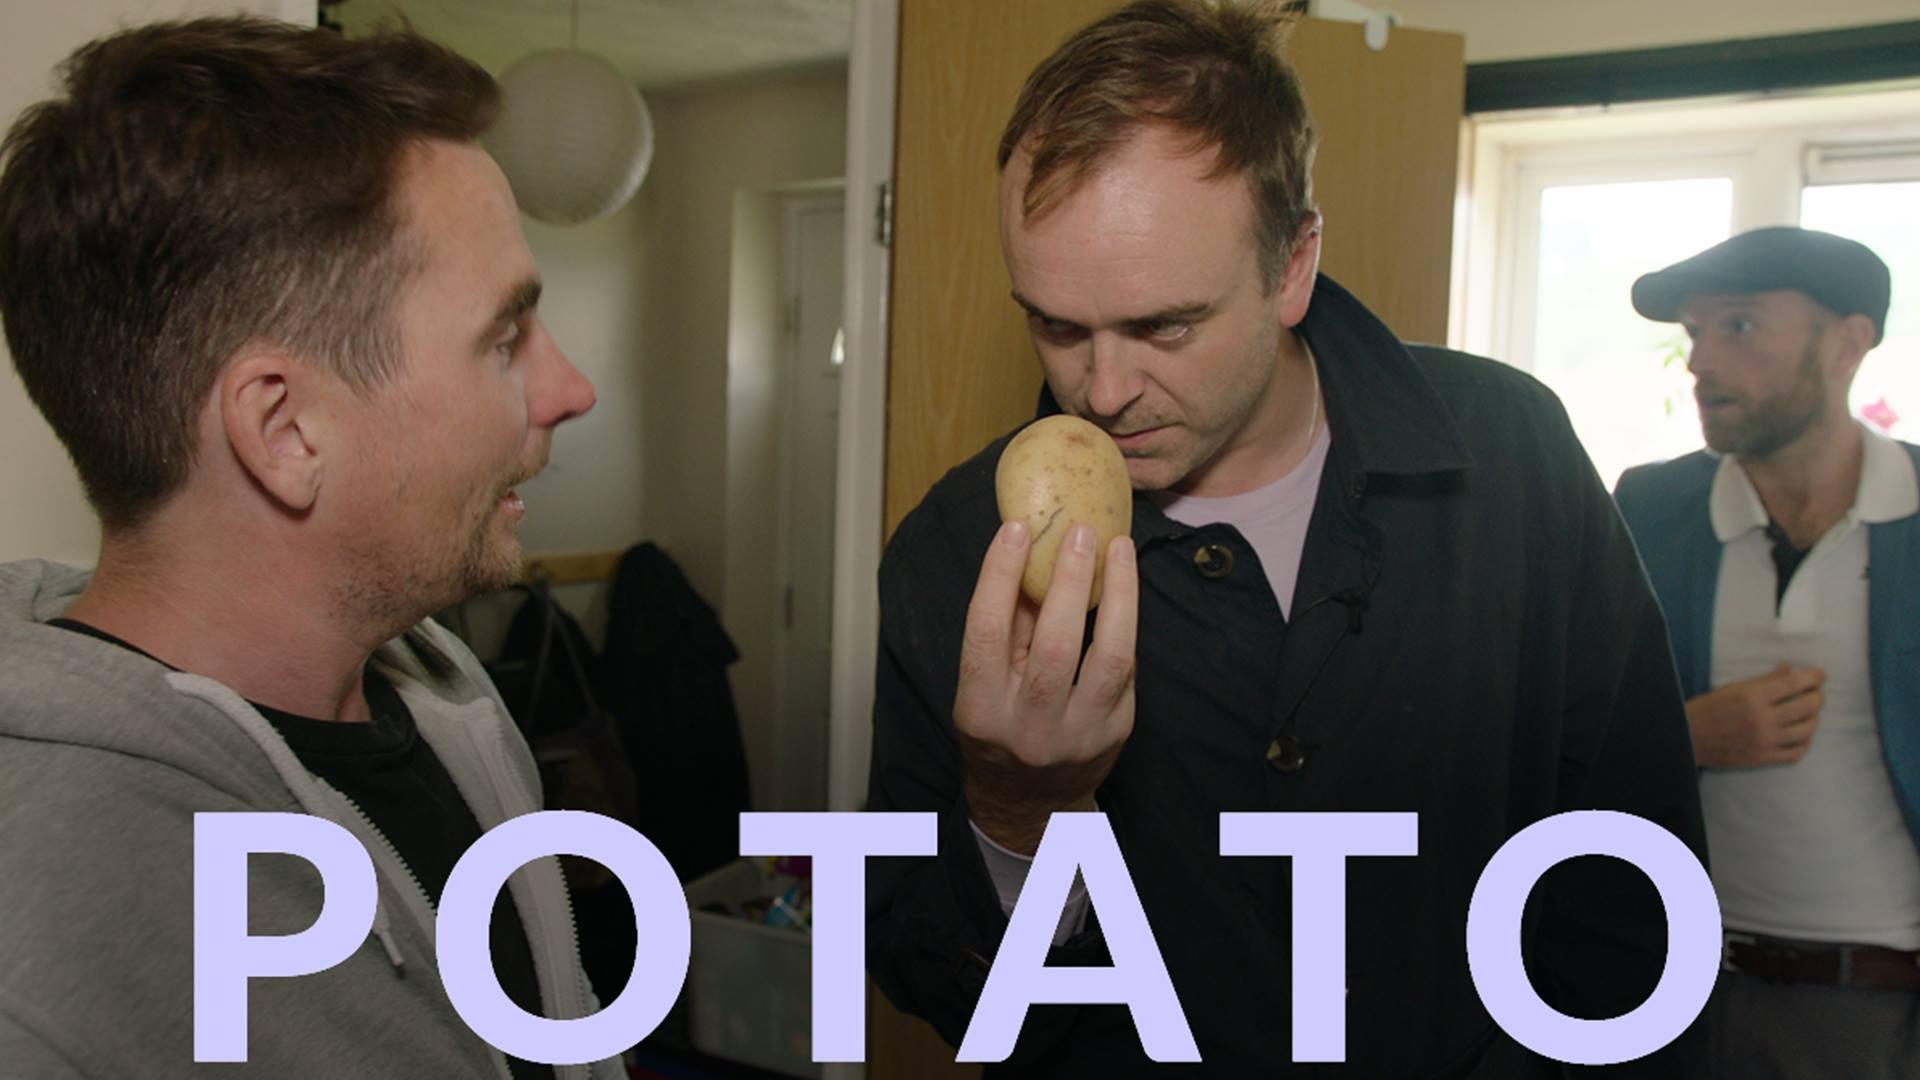 Episode 9: Potato